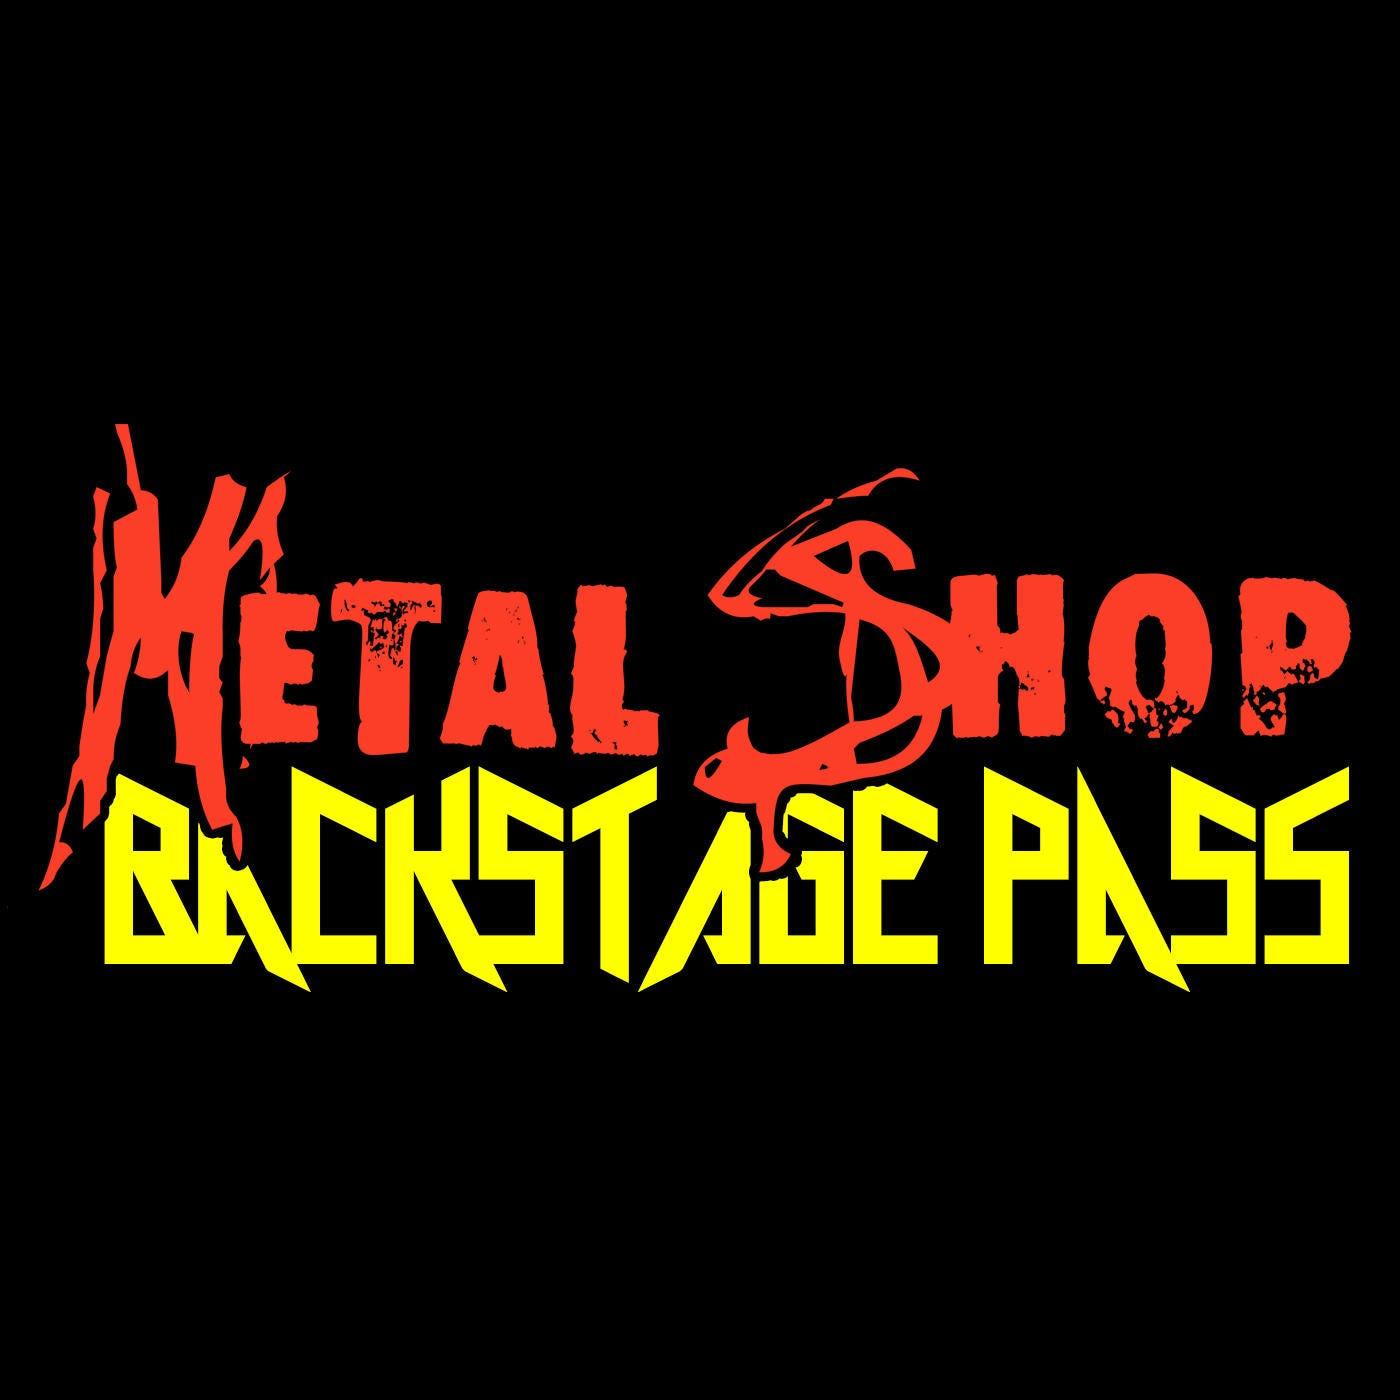 Metal Shop's Backstage Pass